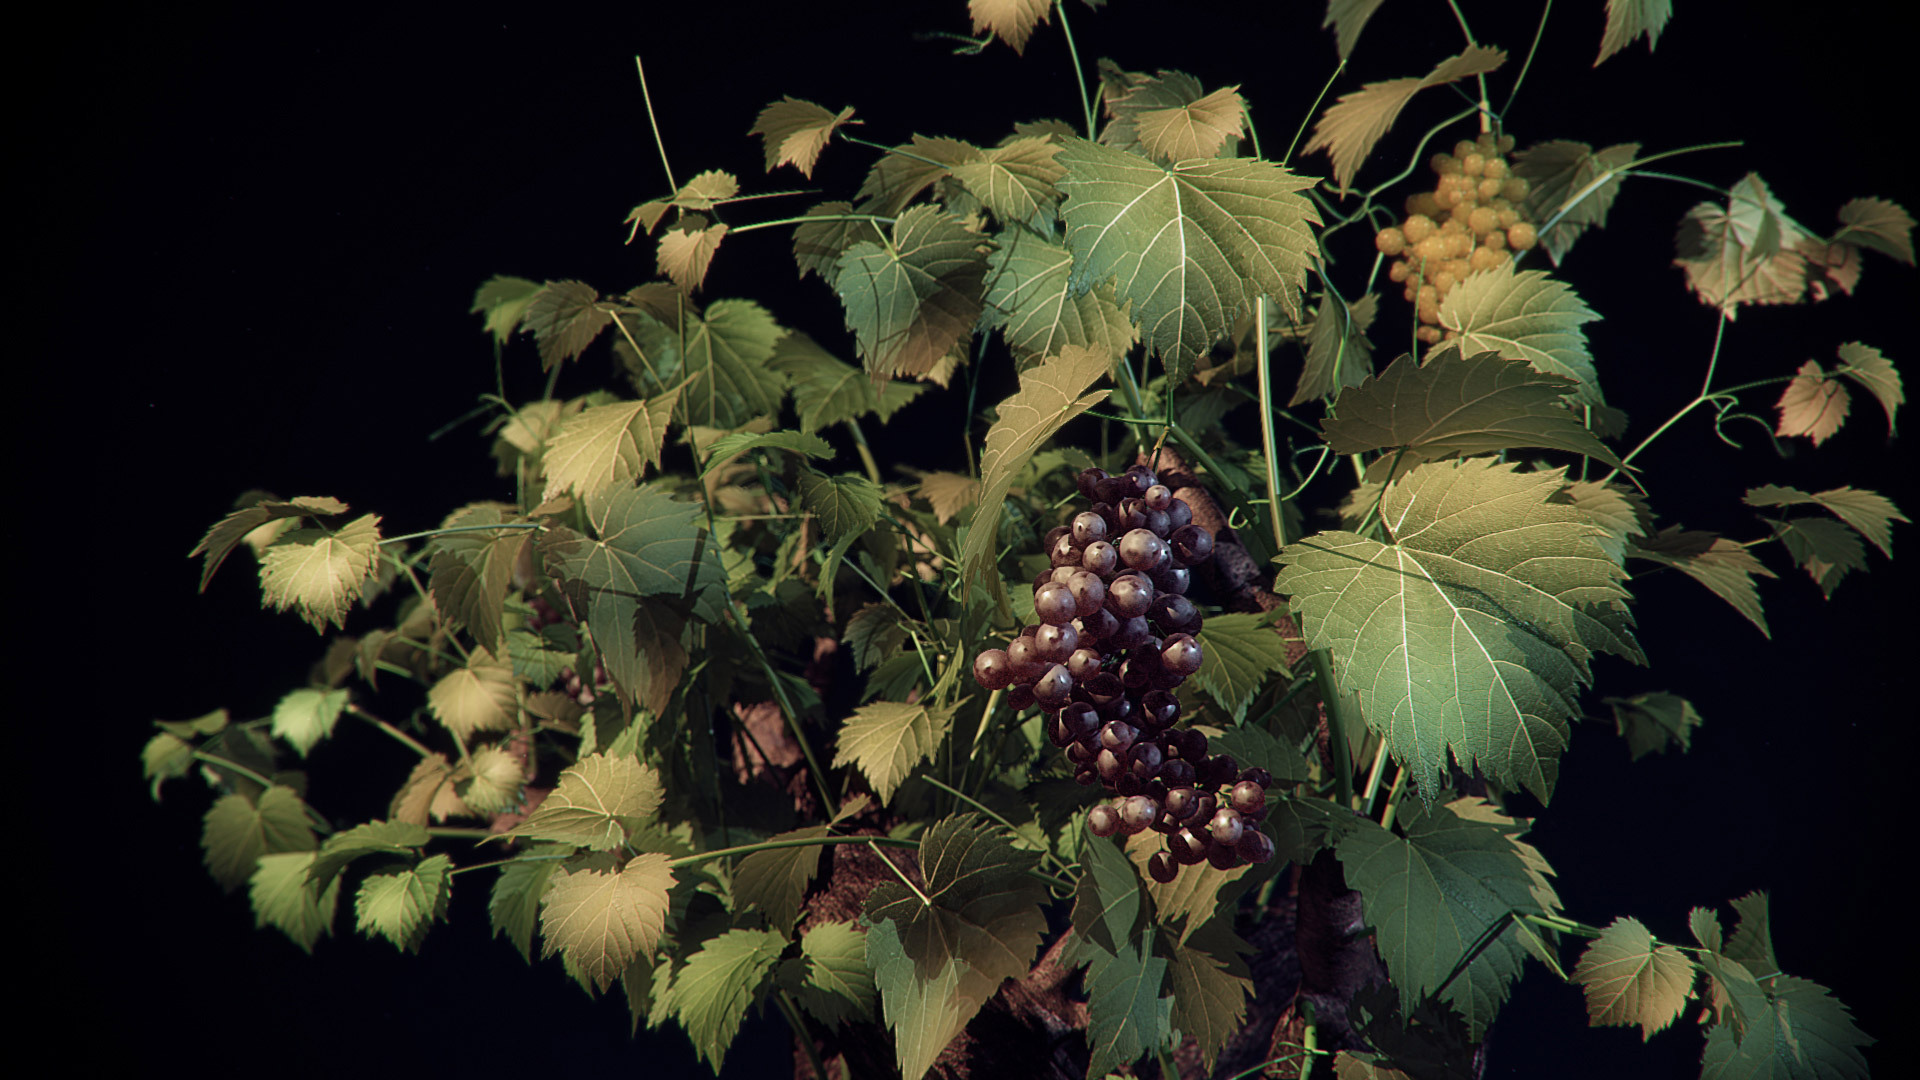 07 the vine hd